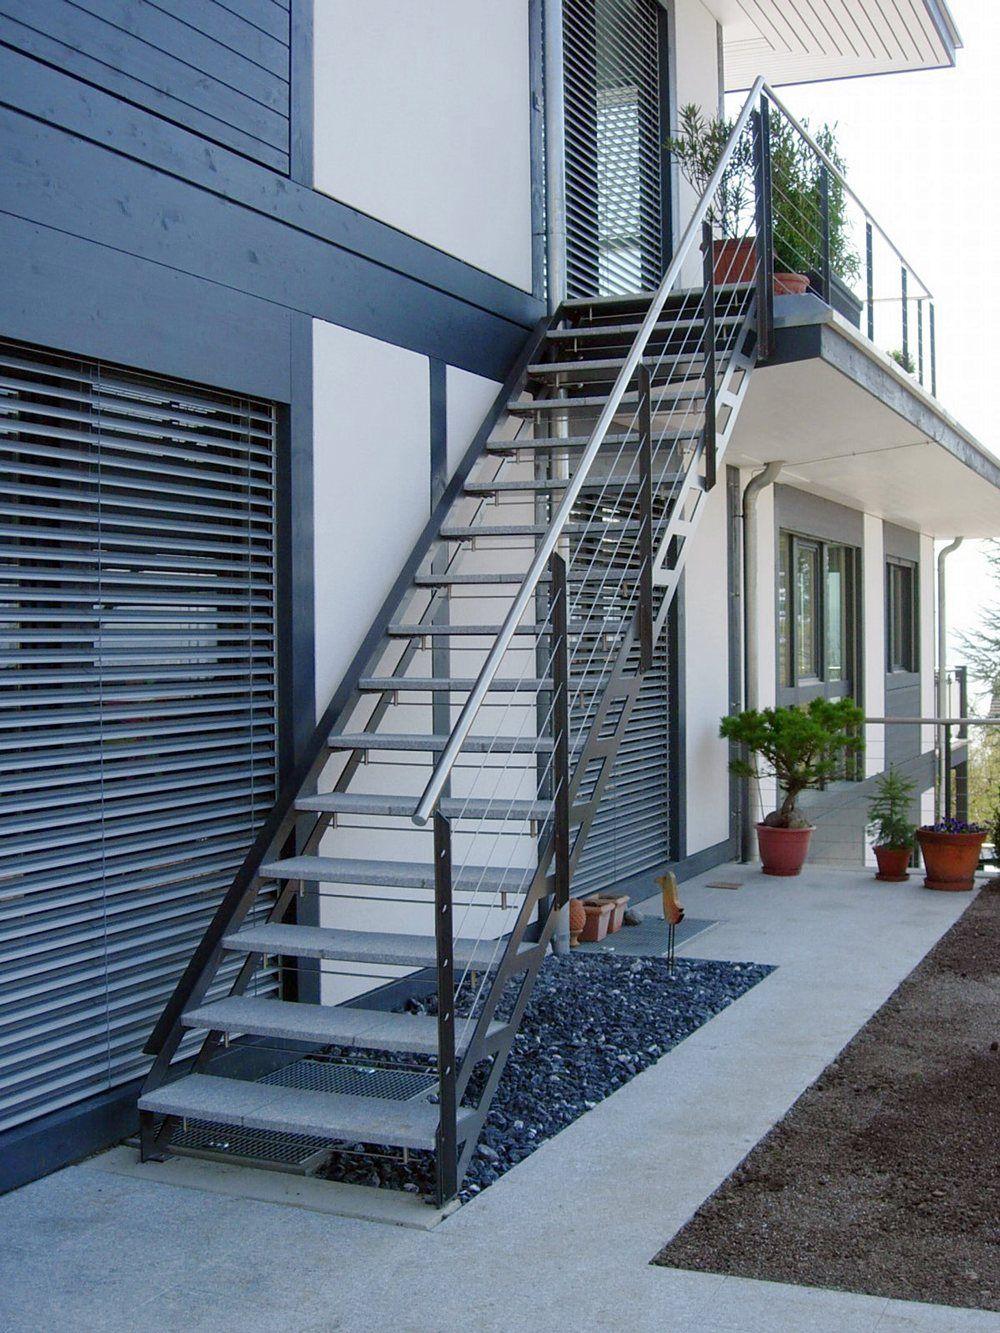 Keller Mit Aussentreppe Google Zoeken … Aussentreppe   Outside Stairs For House